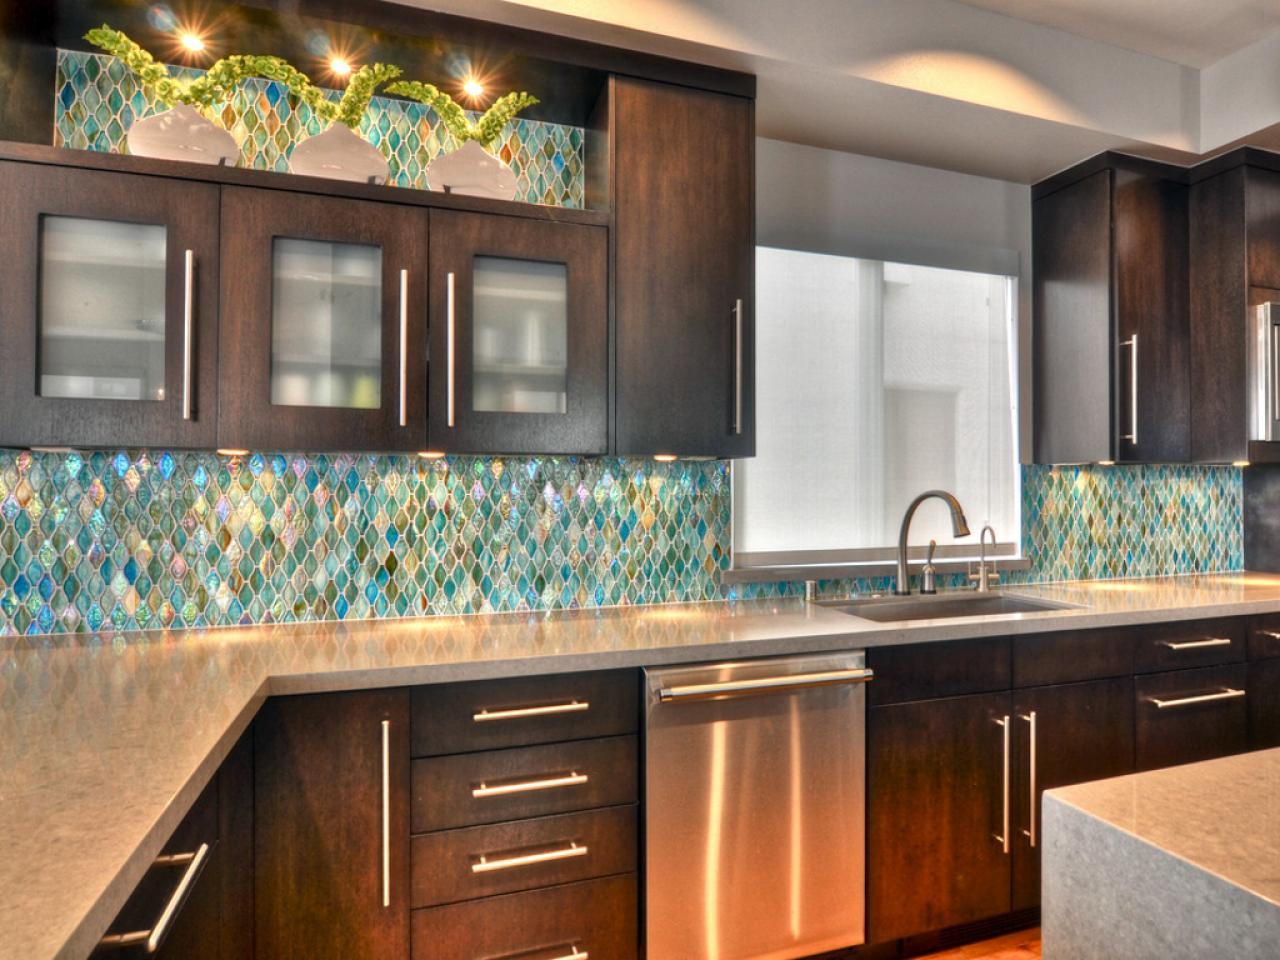 Cool Glass Backsplash Ideas kitchen glass backsplash designs